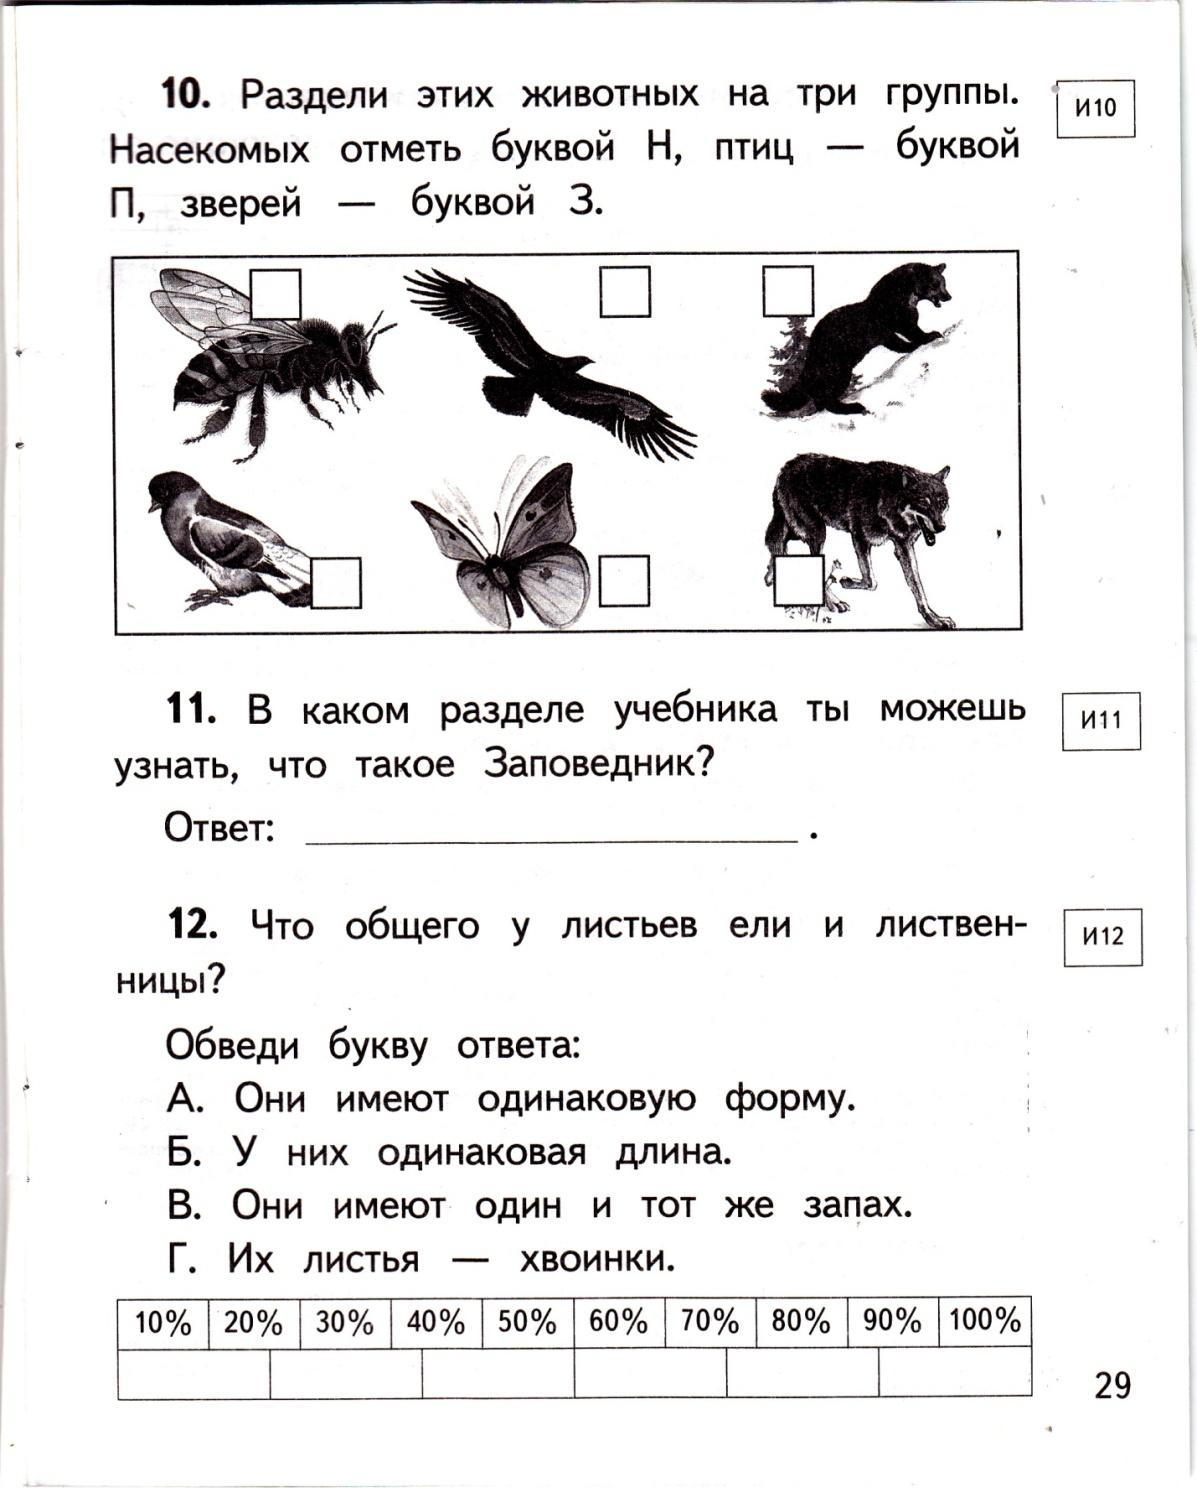 C:\Users\МБОУ СОШ № 4\Desktop\для Жуковой С.Н\IMG_0039.jpg